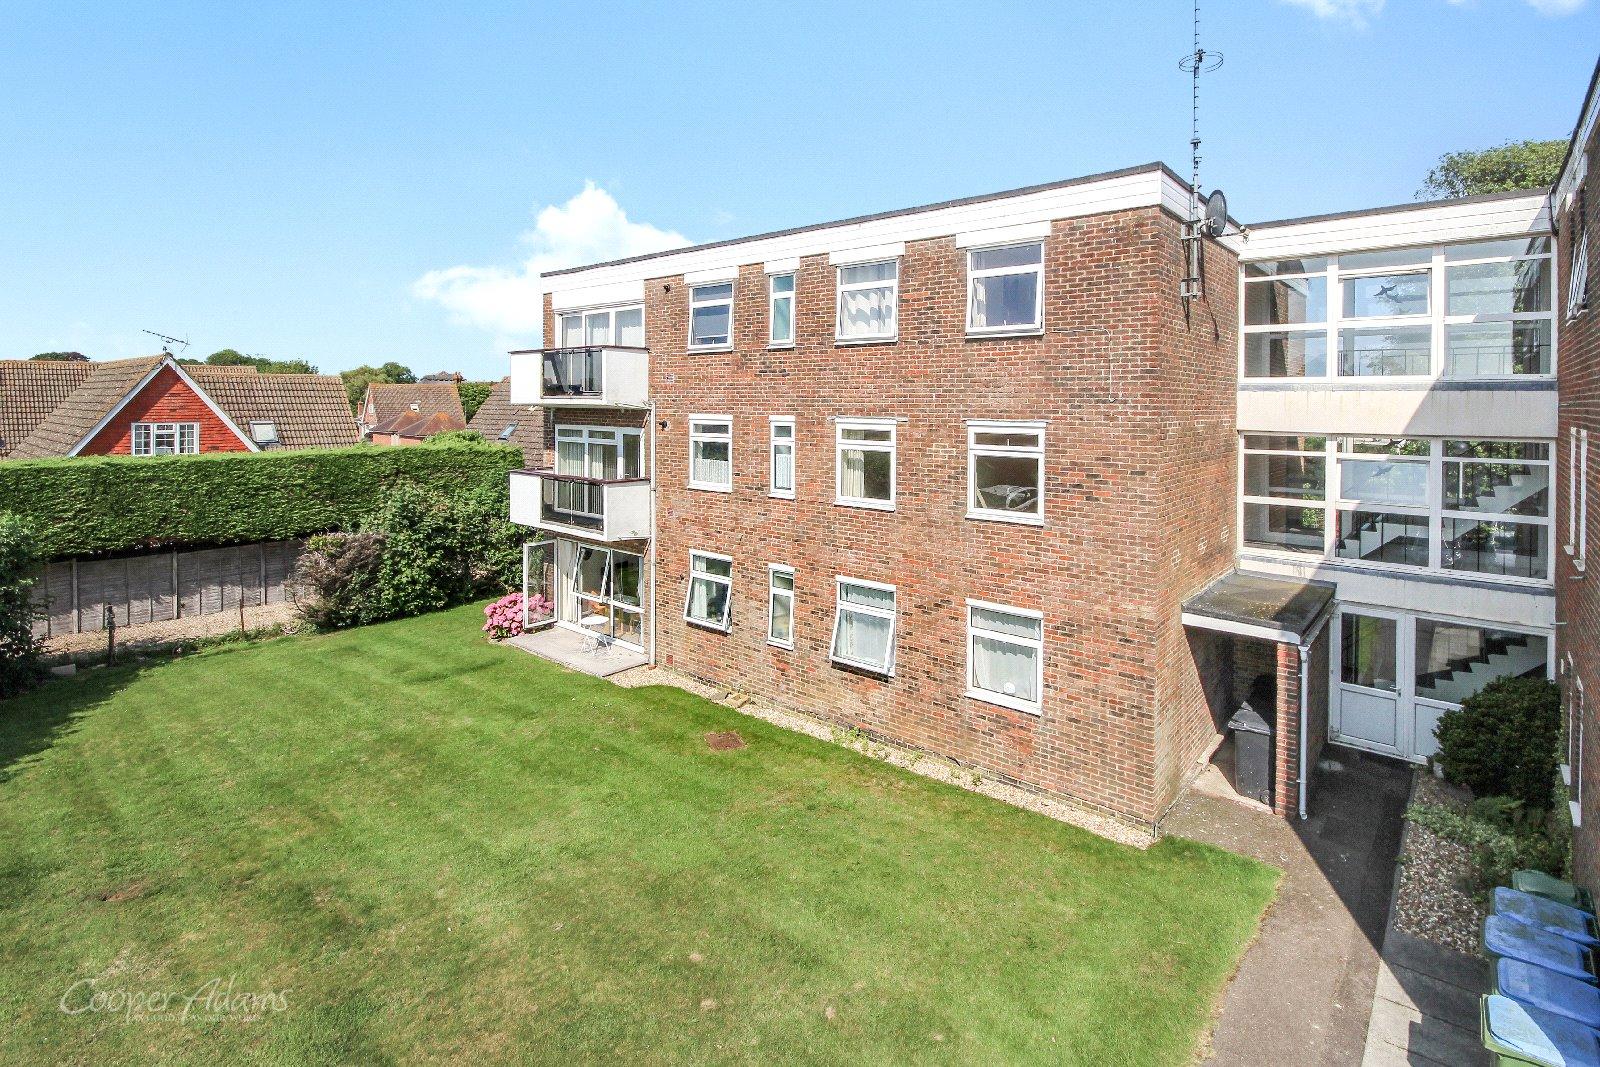 2 bed apartment for sale in Clare Lodge, Sea Lane, Rustington, BN16